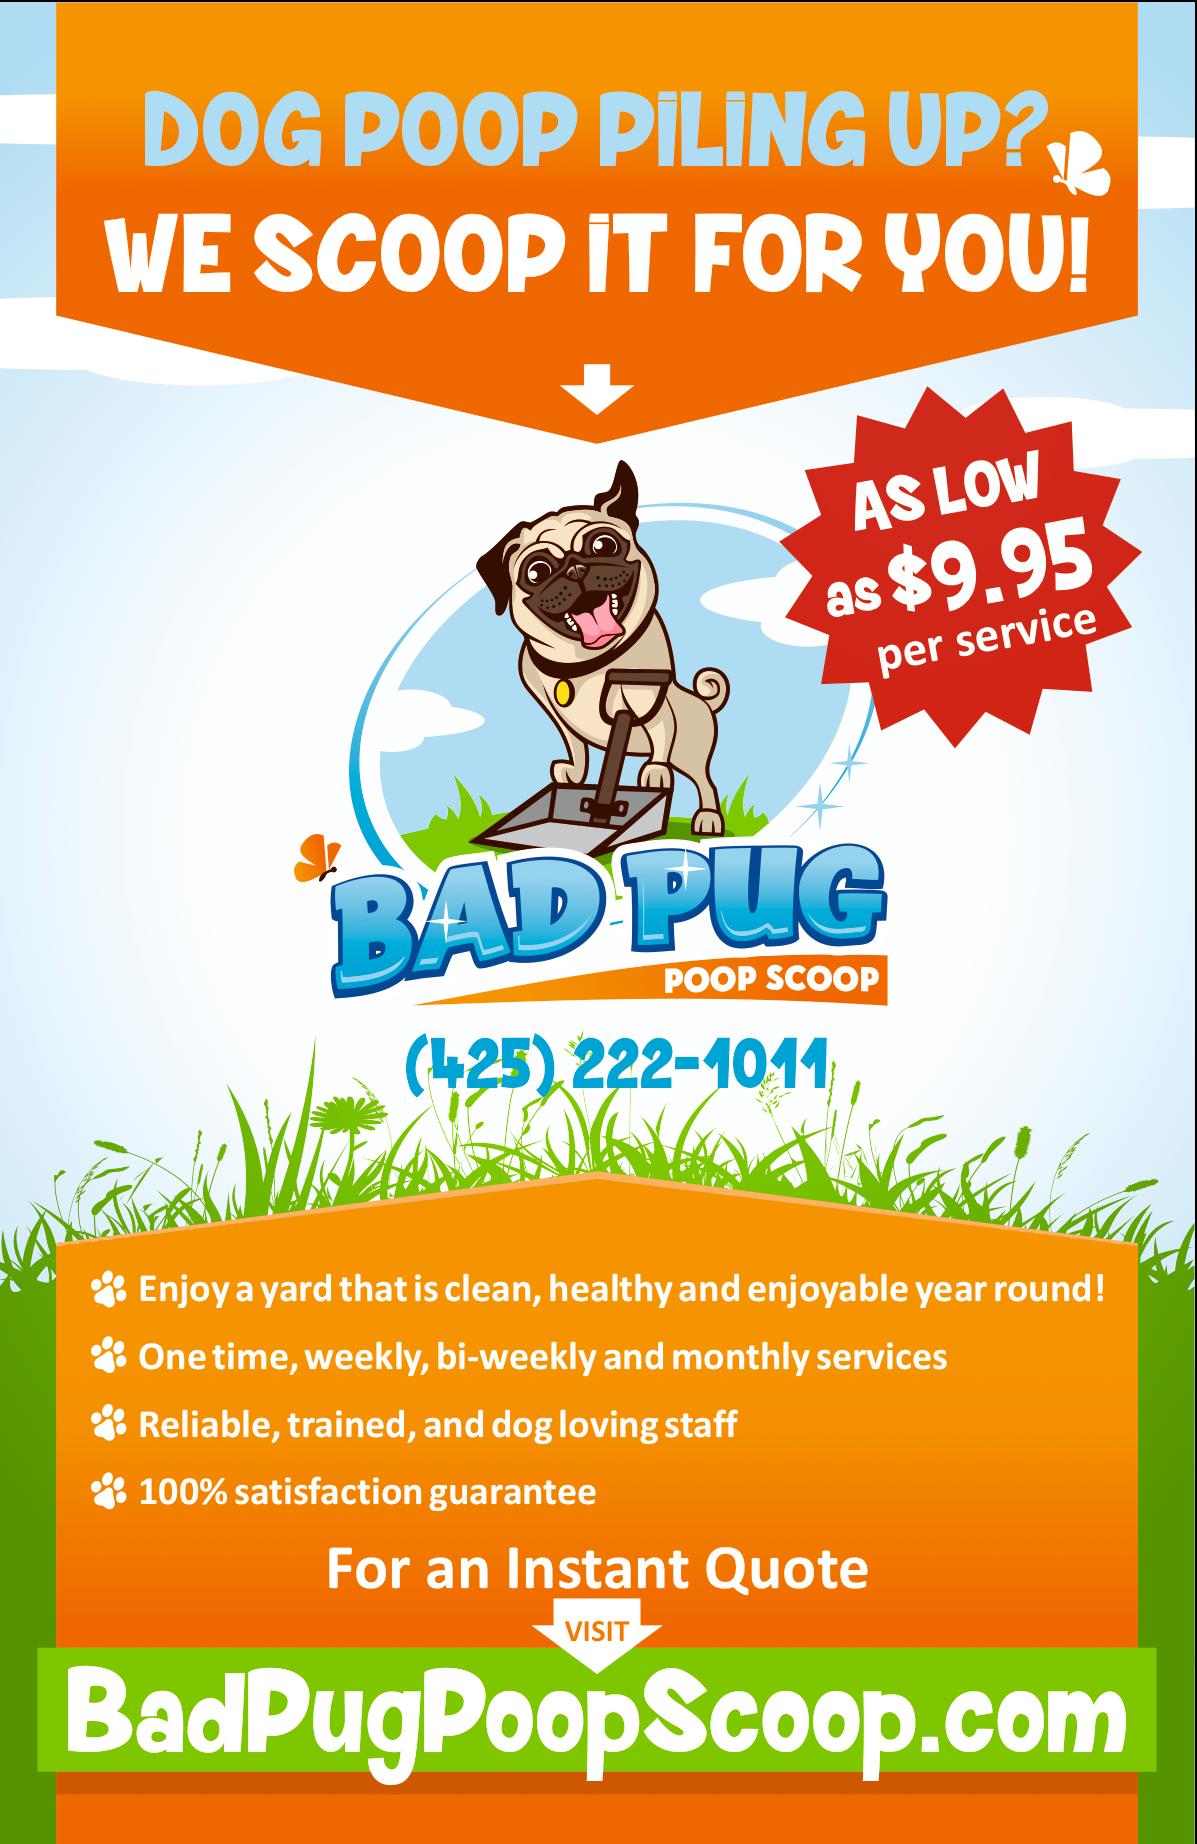 Revision to Bad Pug Poop Scoop flyer